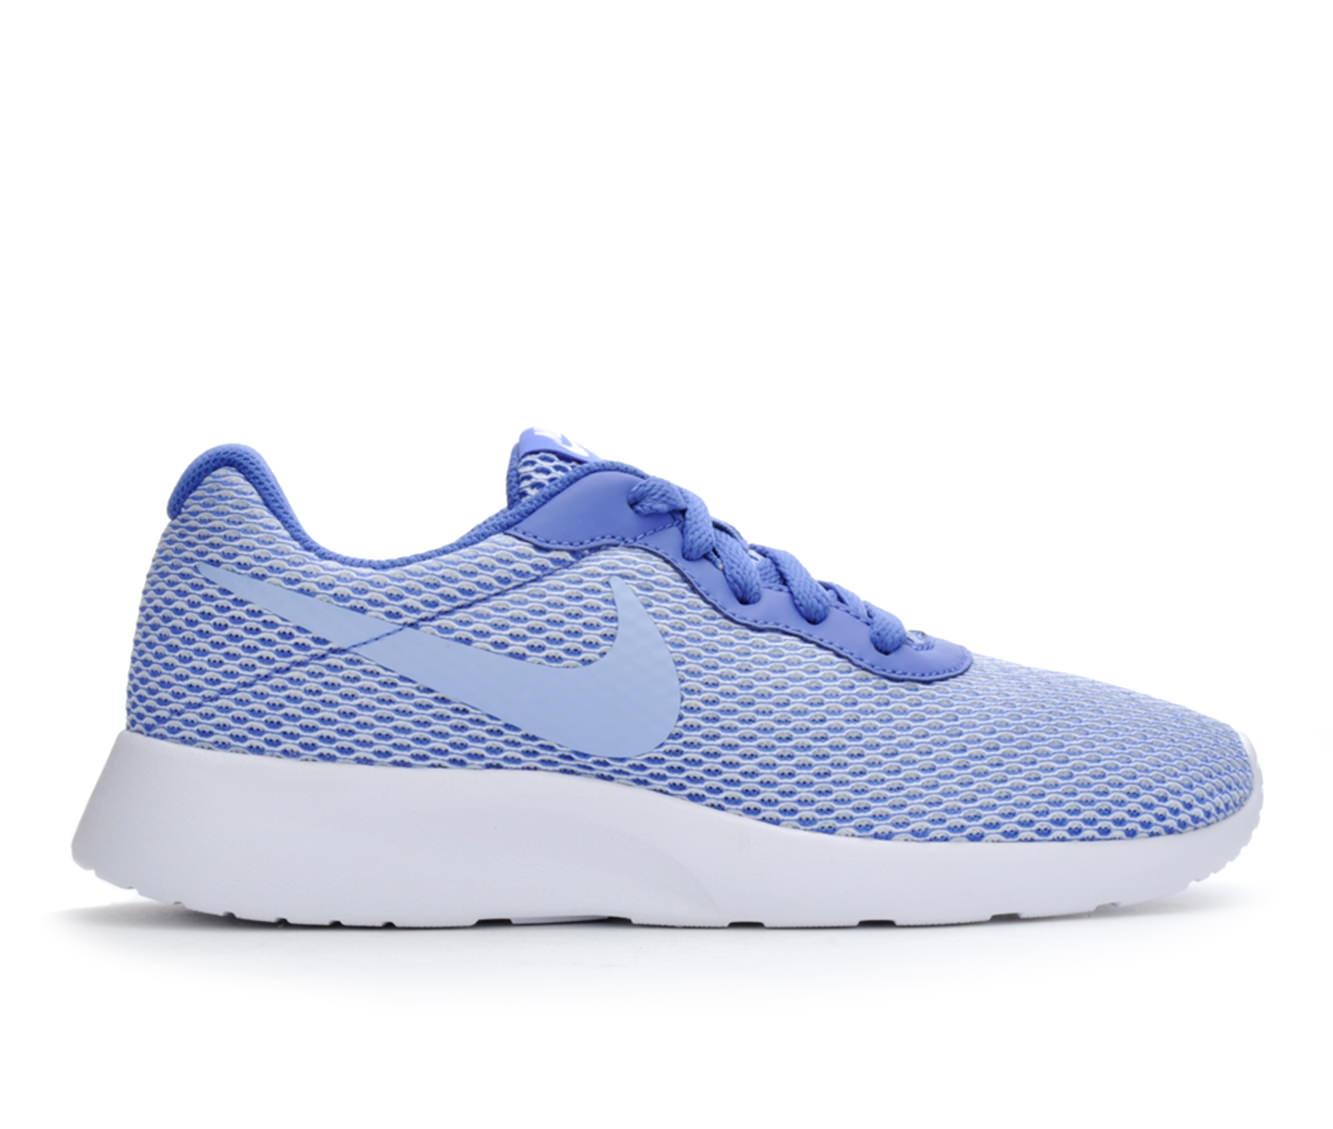 Women's Nike Tanjun SE Sneakers (Blue - Size 10.5) 1637827